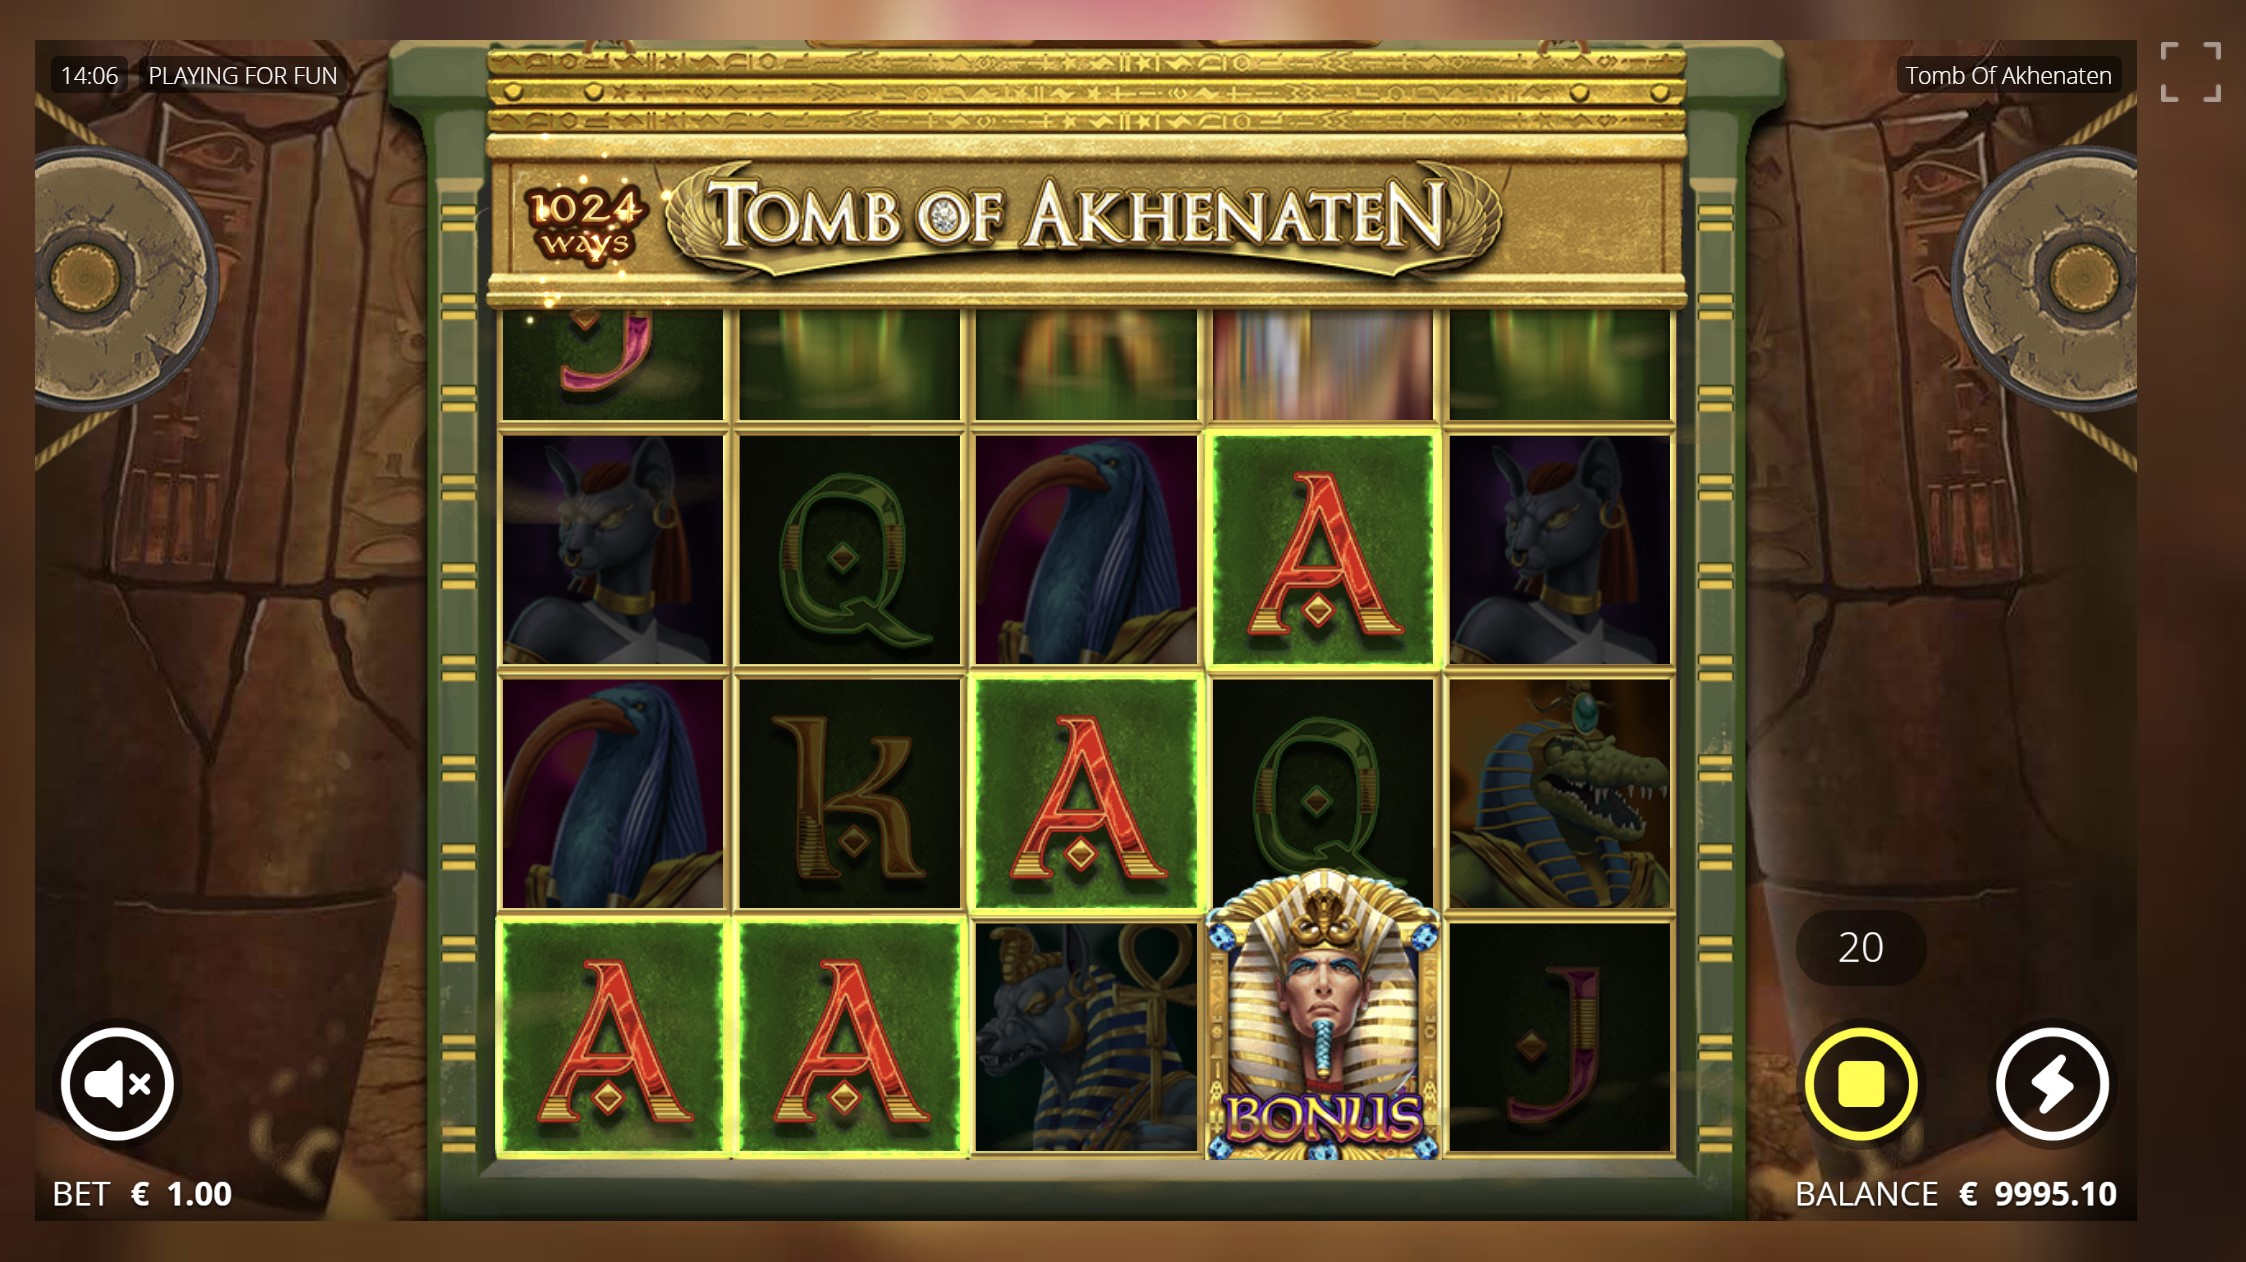 tomb of akhenaten lošimo automatas slot